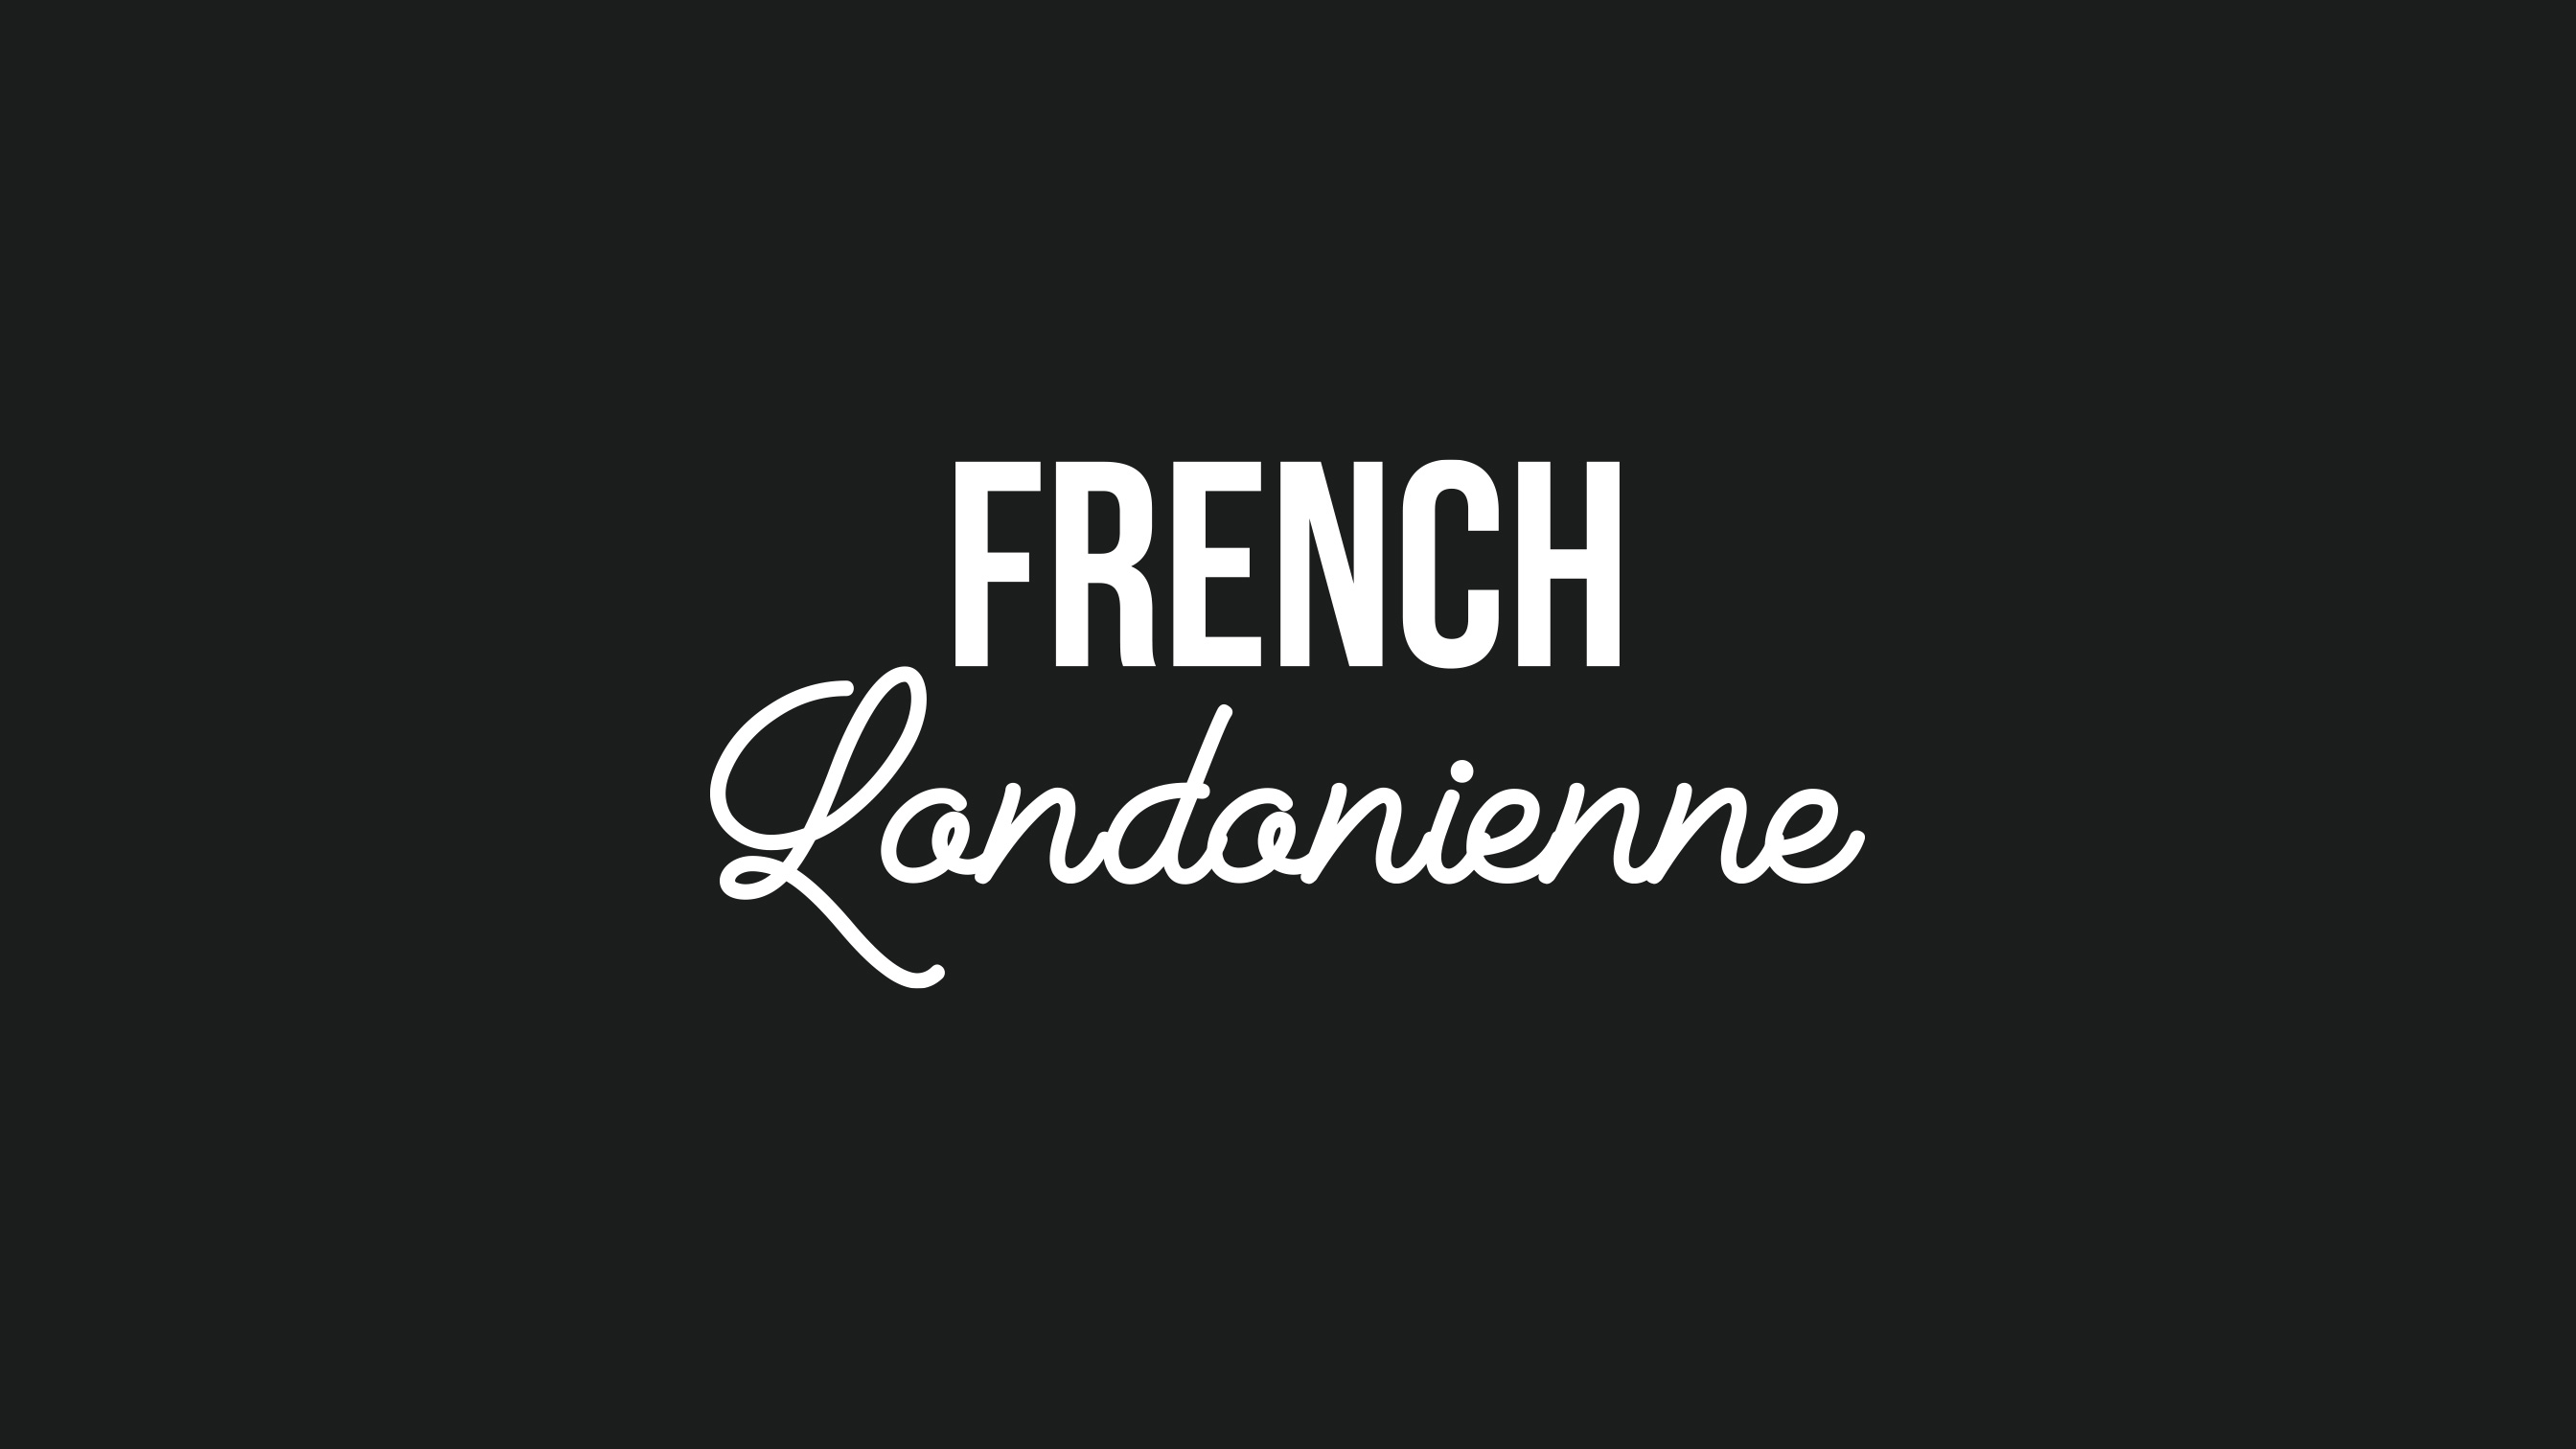 01-french-londonienne-pikteo-webdesign-graphic-design-freelance-paris-bruxelles-londres